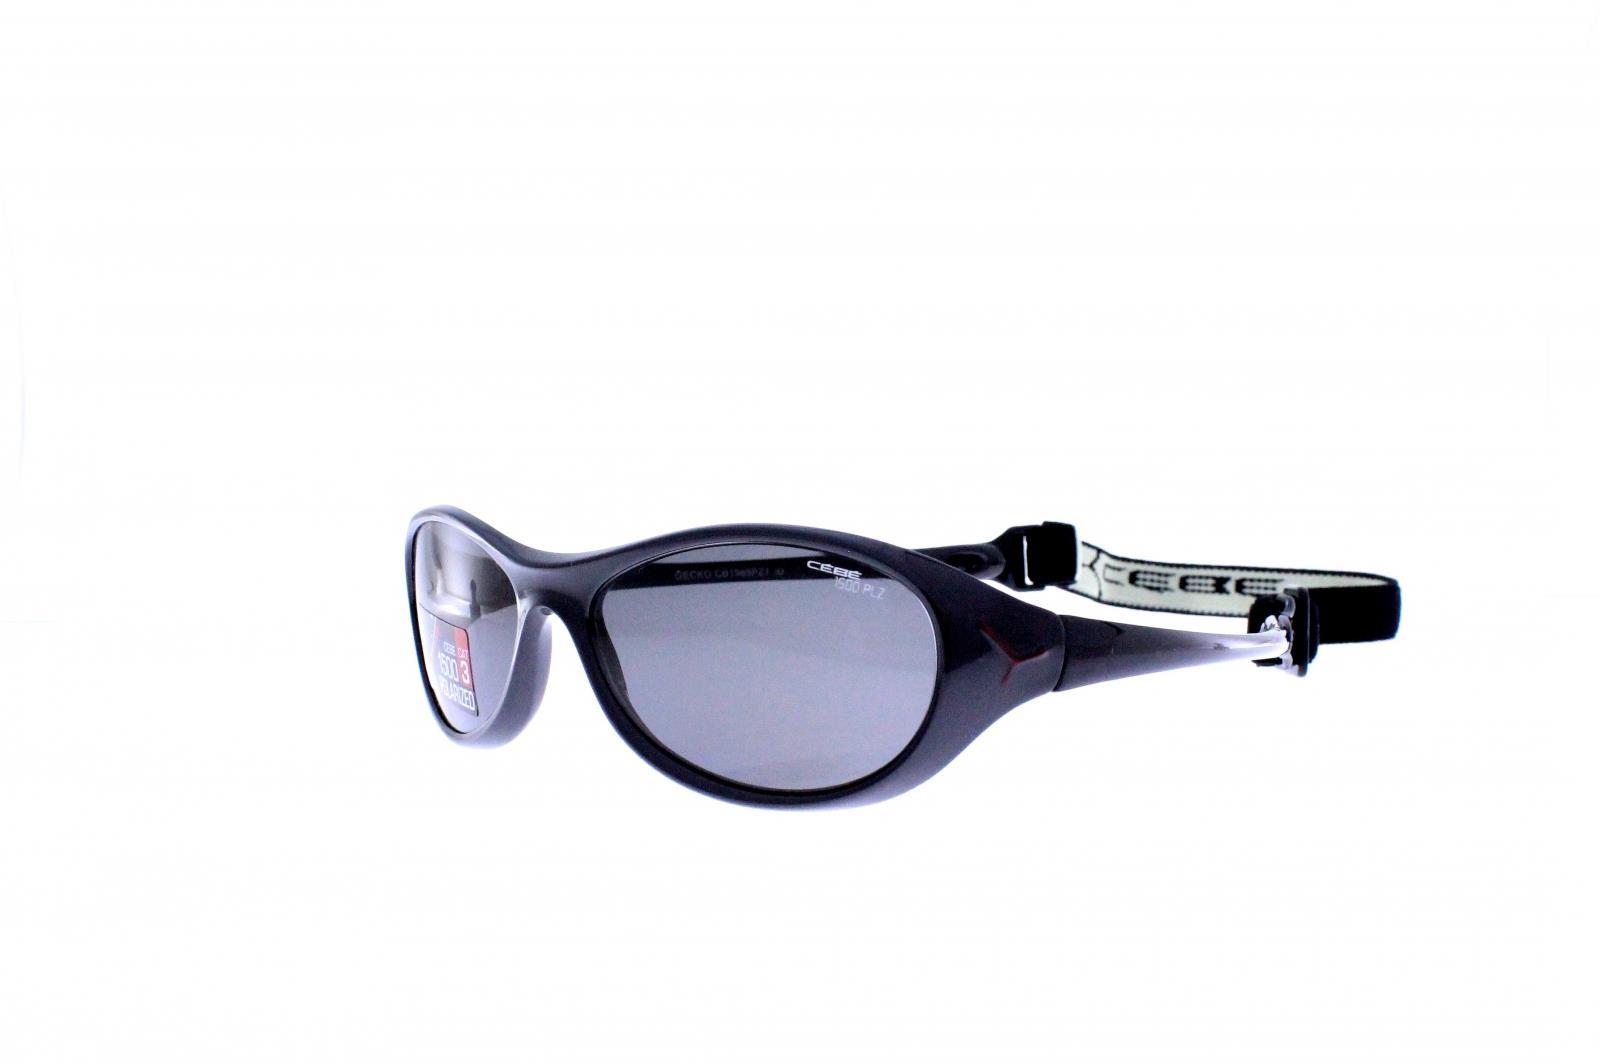 Cebe Gecko Çocuk Gözlük Parlak Glosy Siyah 1500 Grey Cb1985Pz1